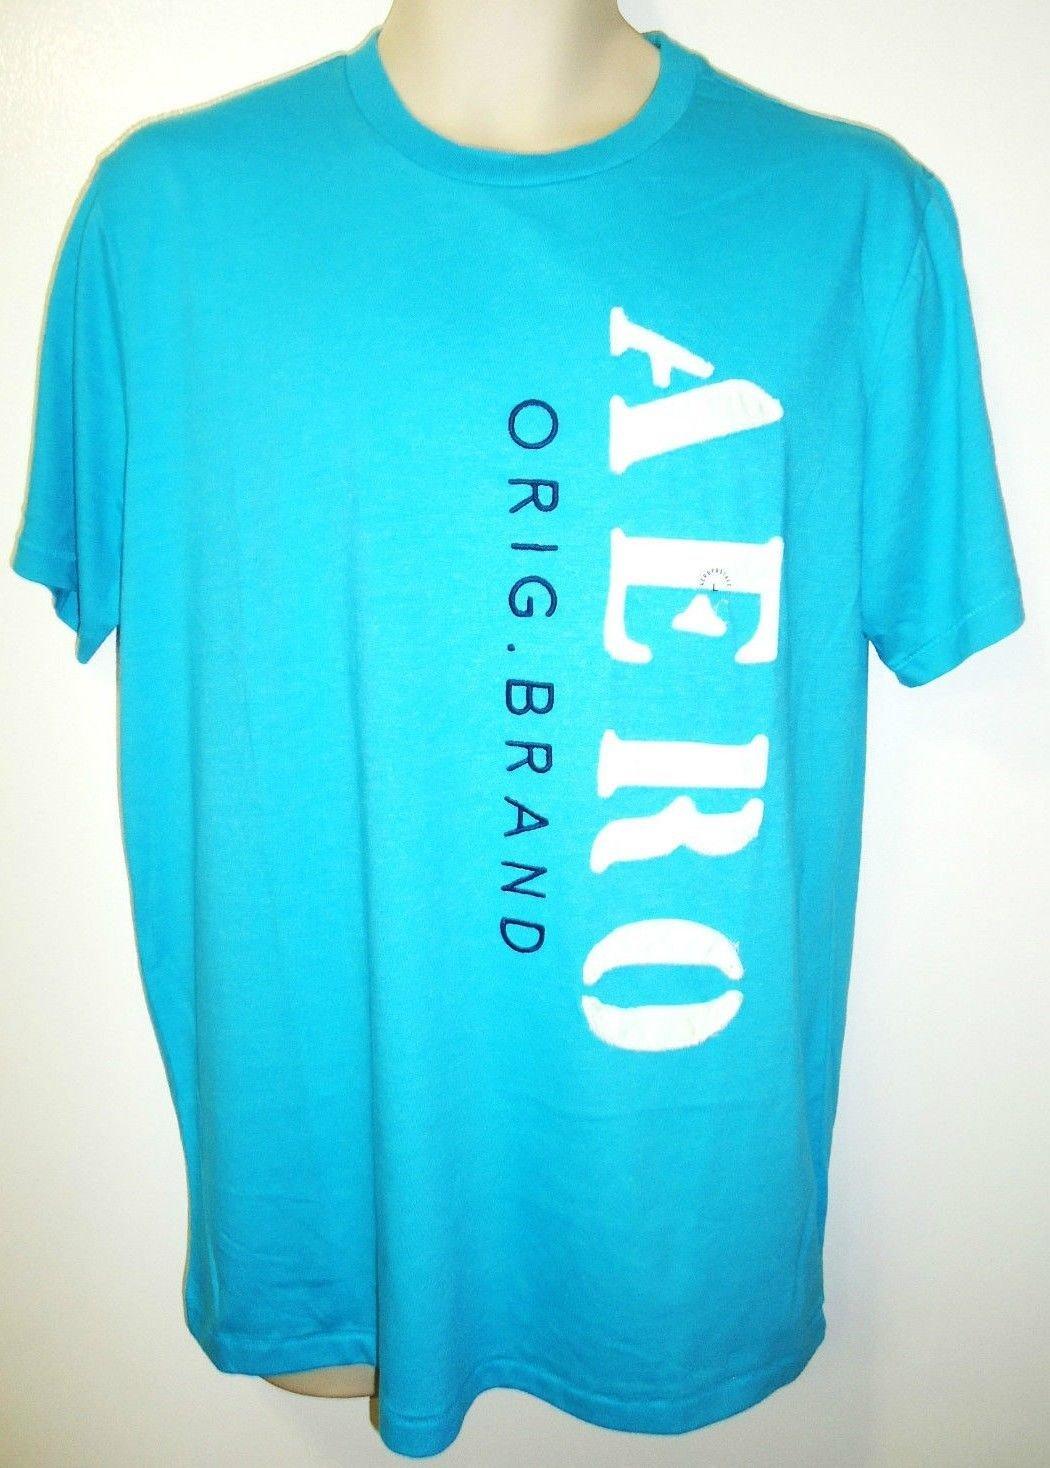 AREOPOSTALE - AQUA - BLUE - WHITE - LARGE - AERO - BRAND - T-SHIRT - NEW - TEE